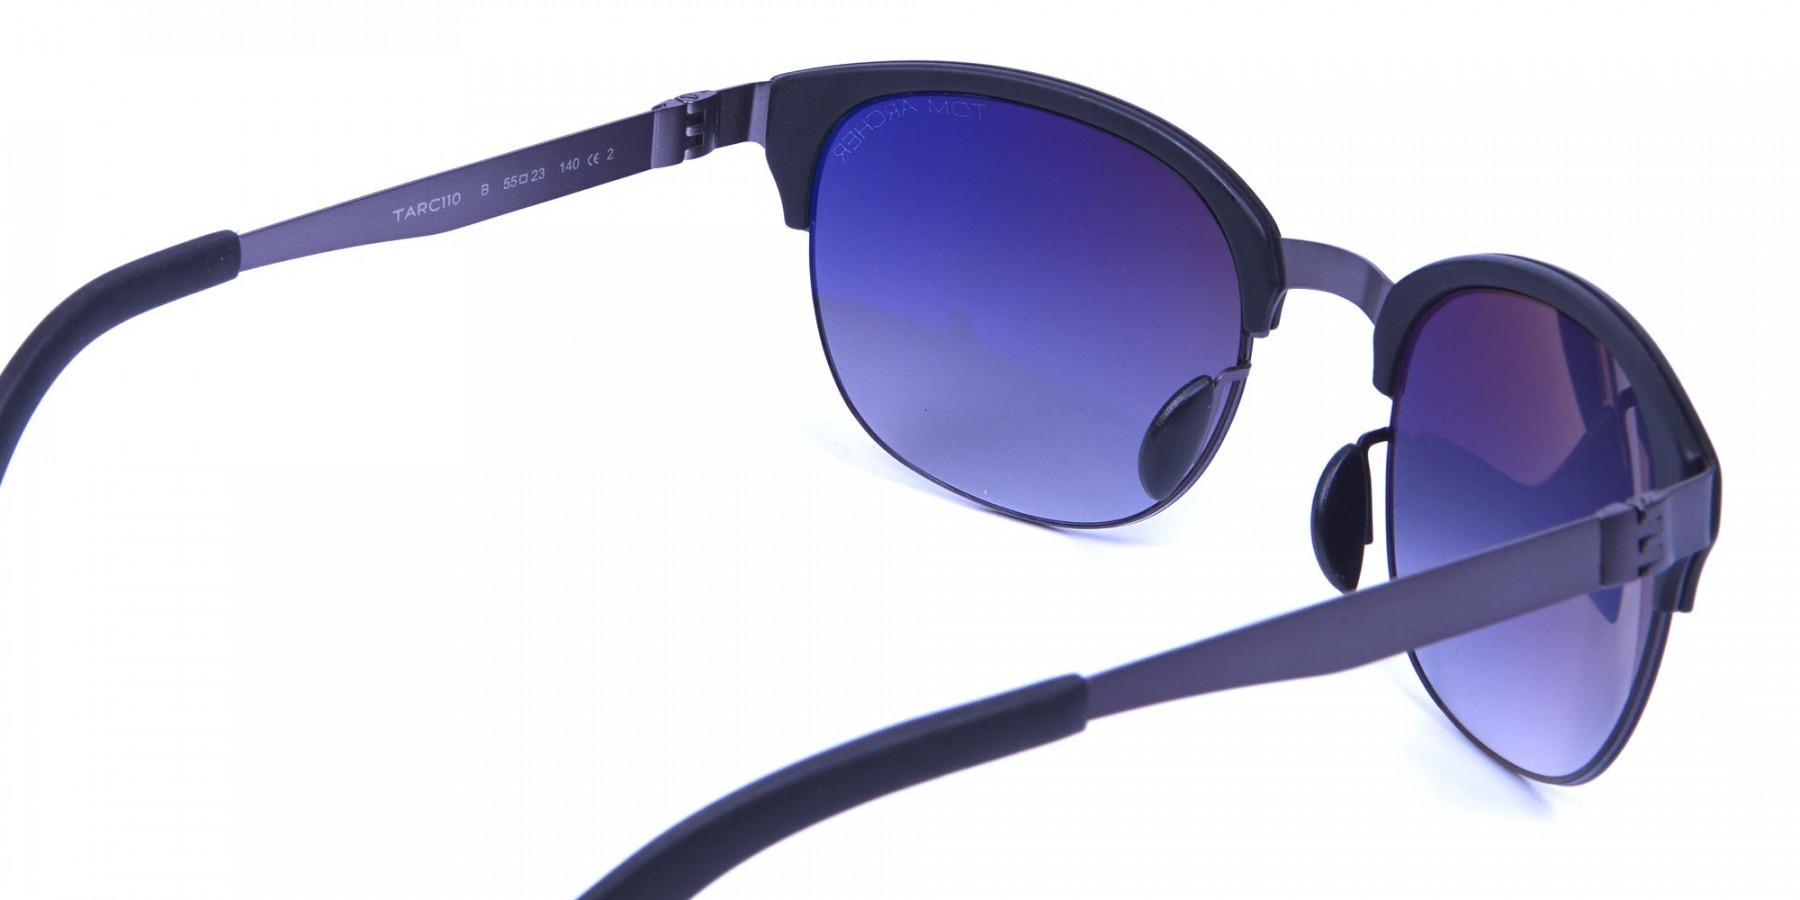 Gunmetal Sunglasses with Cool Tint -2